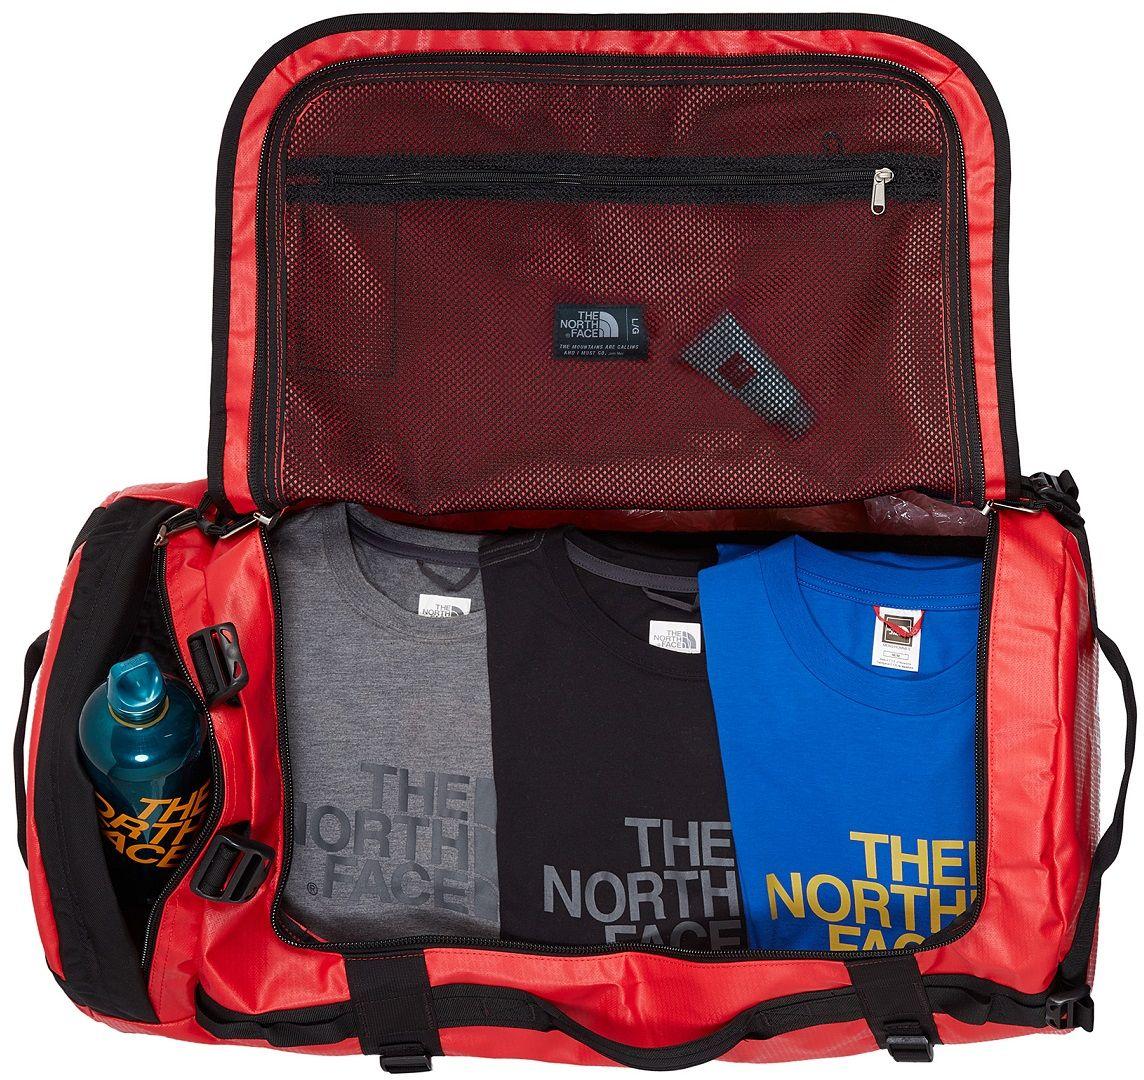 north face bag travel